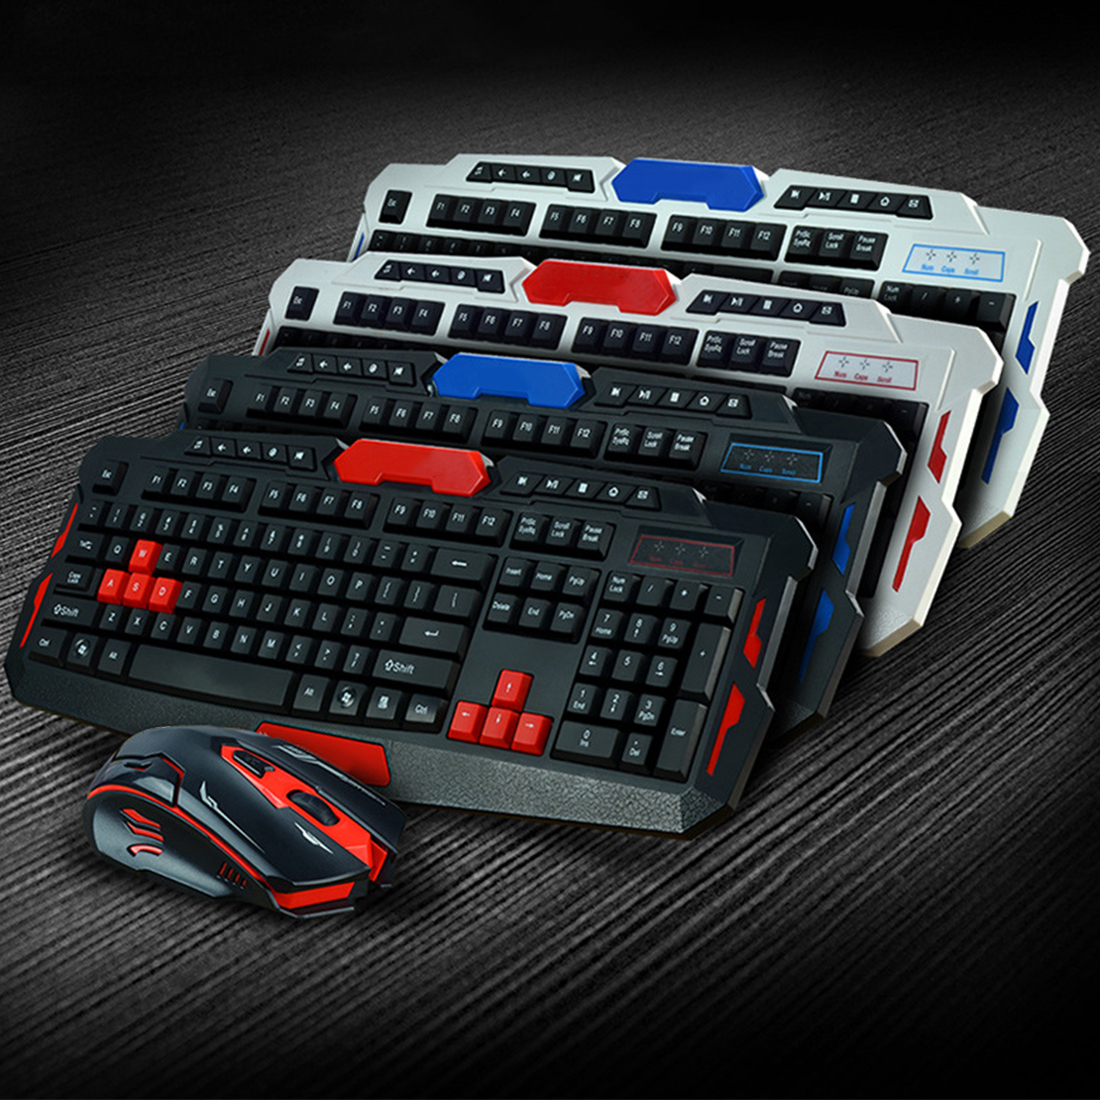 NOYOKERE Wireless Keyboard Mouse Set USB 2.4Ghz 1600DPI Gaming Gamer Mice Multimedia Waterproof for Computer PC desktop